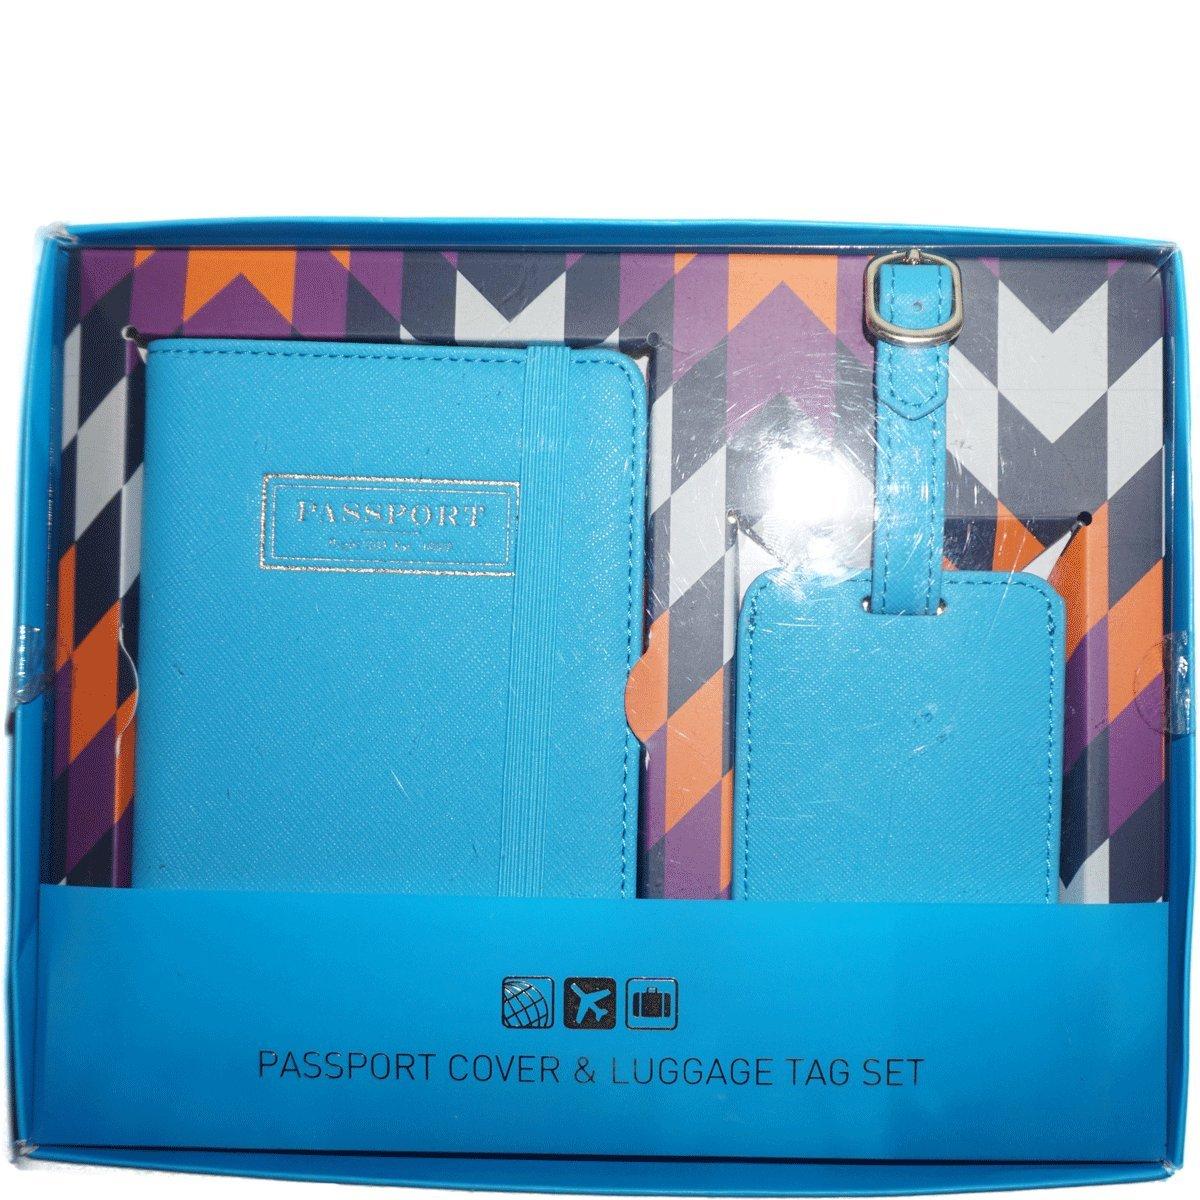 Flight 001 Passport And Luggage Tag Set Turquoise